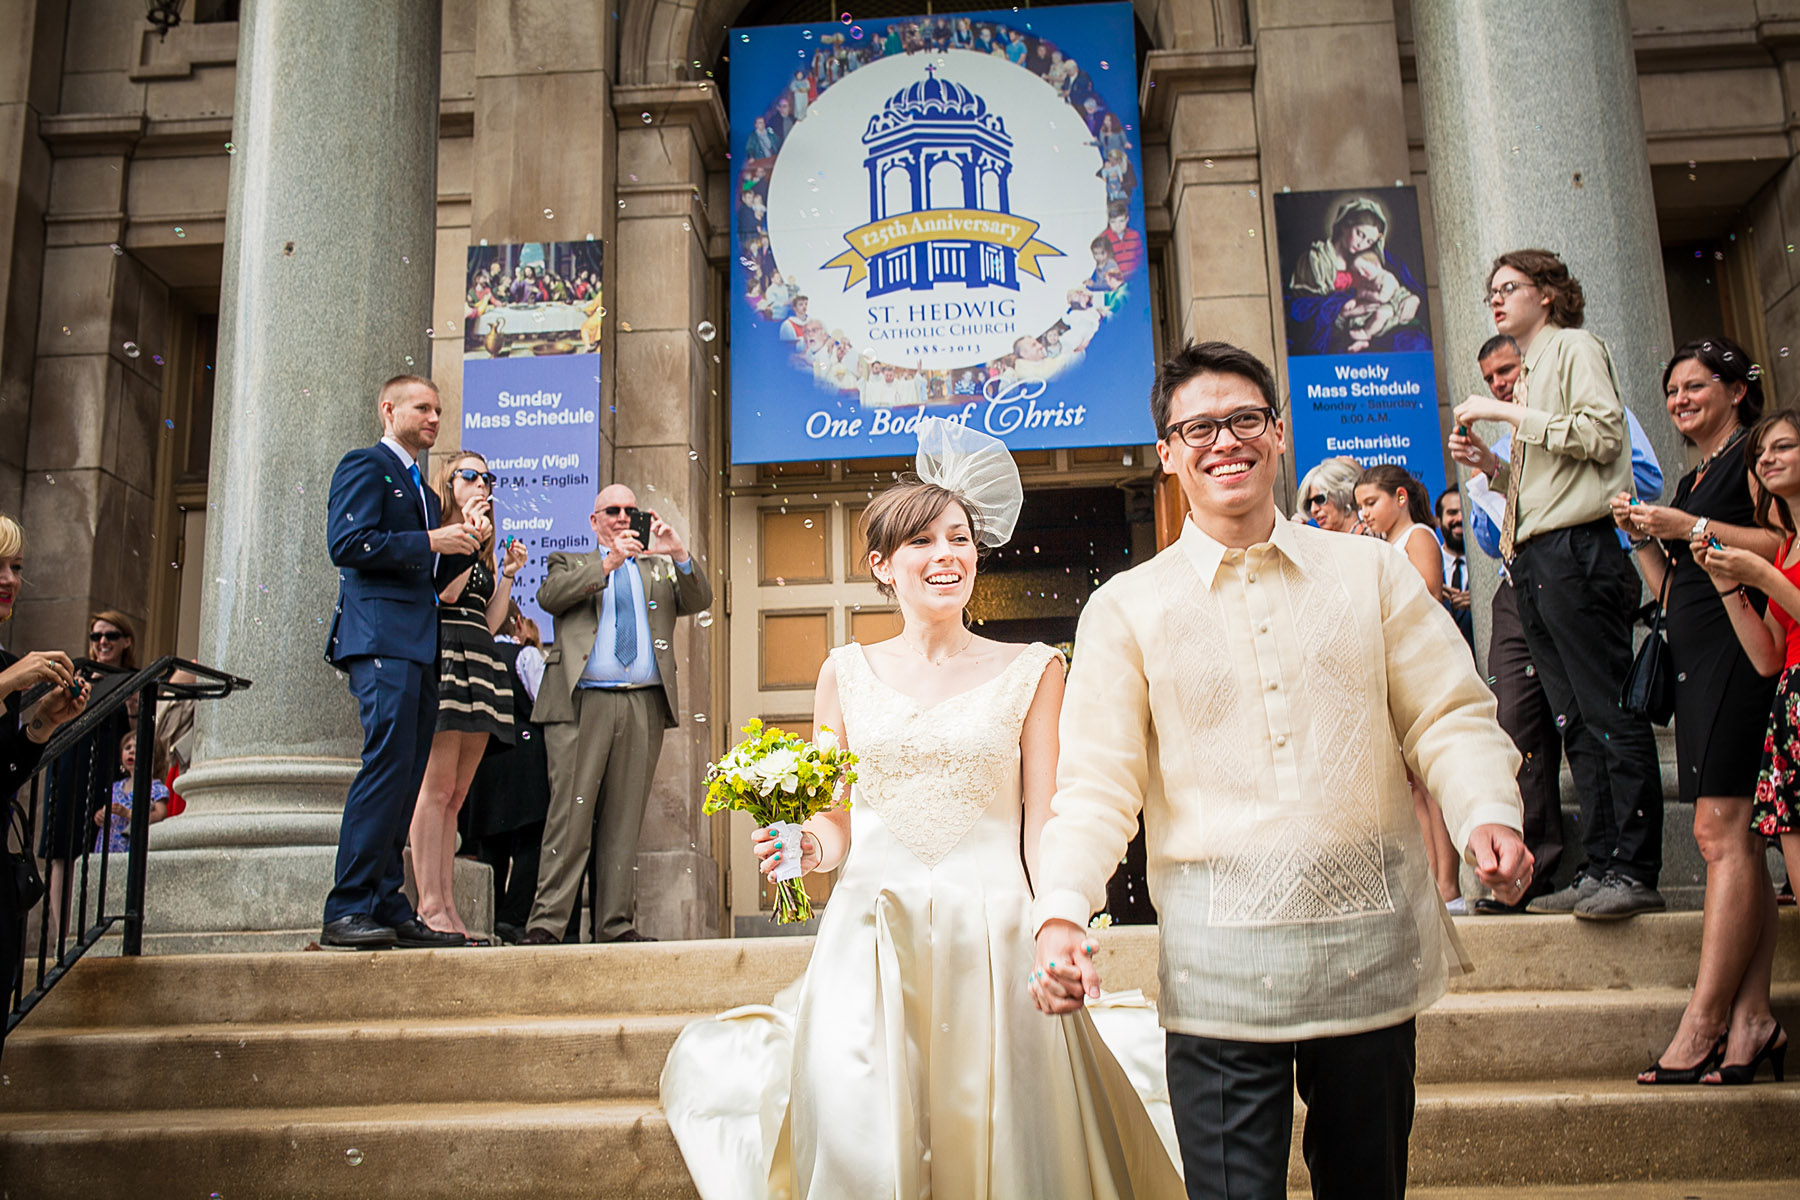 st-hegwig-chicago-urban-arts-society-terrarium-inspired-wedding-documentary-wedding-photography-oriana-koren-24.jpg